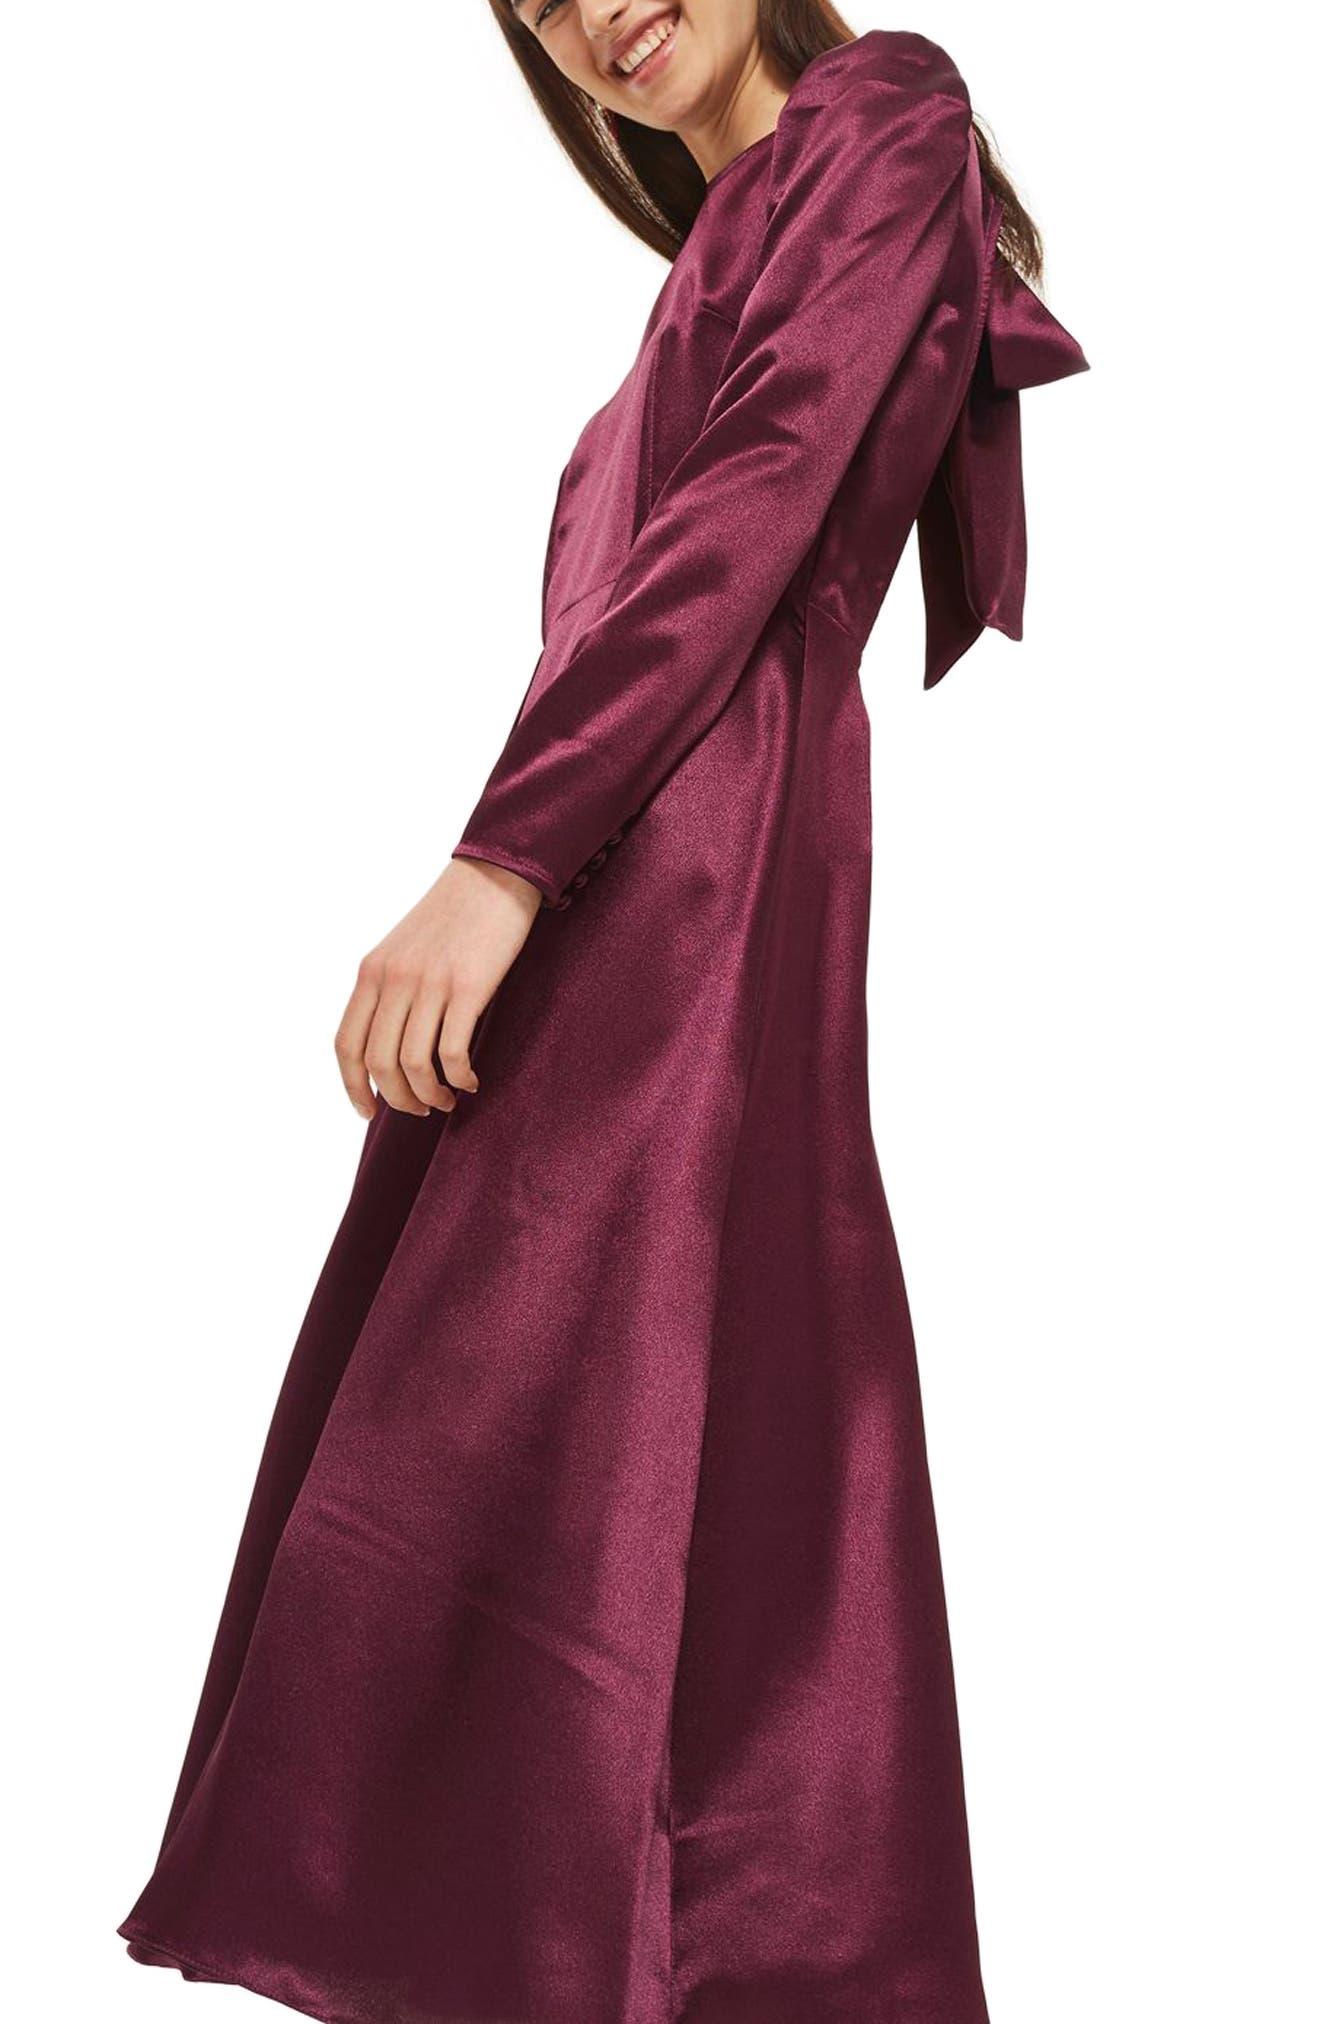 Shimmer Satin Tie Back Midi Dress,                             Alternate thumbnail 3, color,                             930